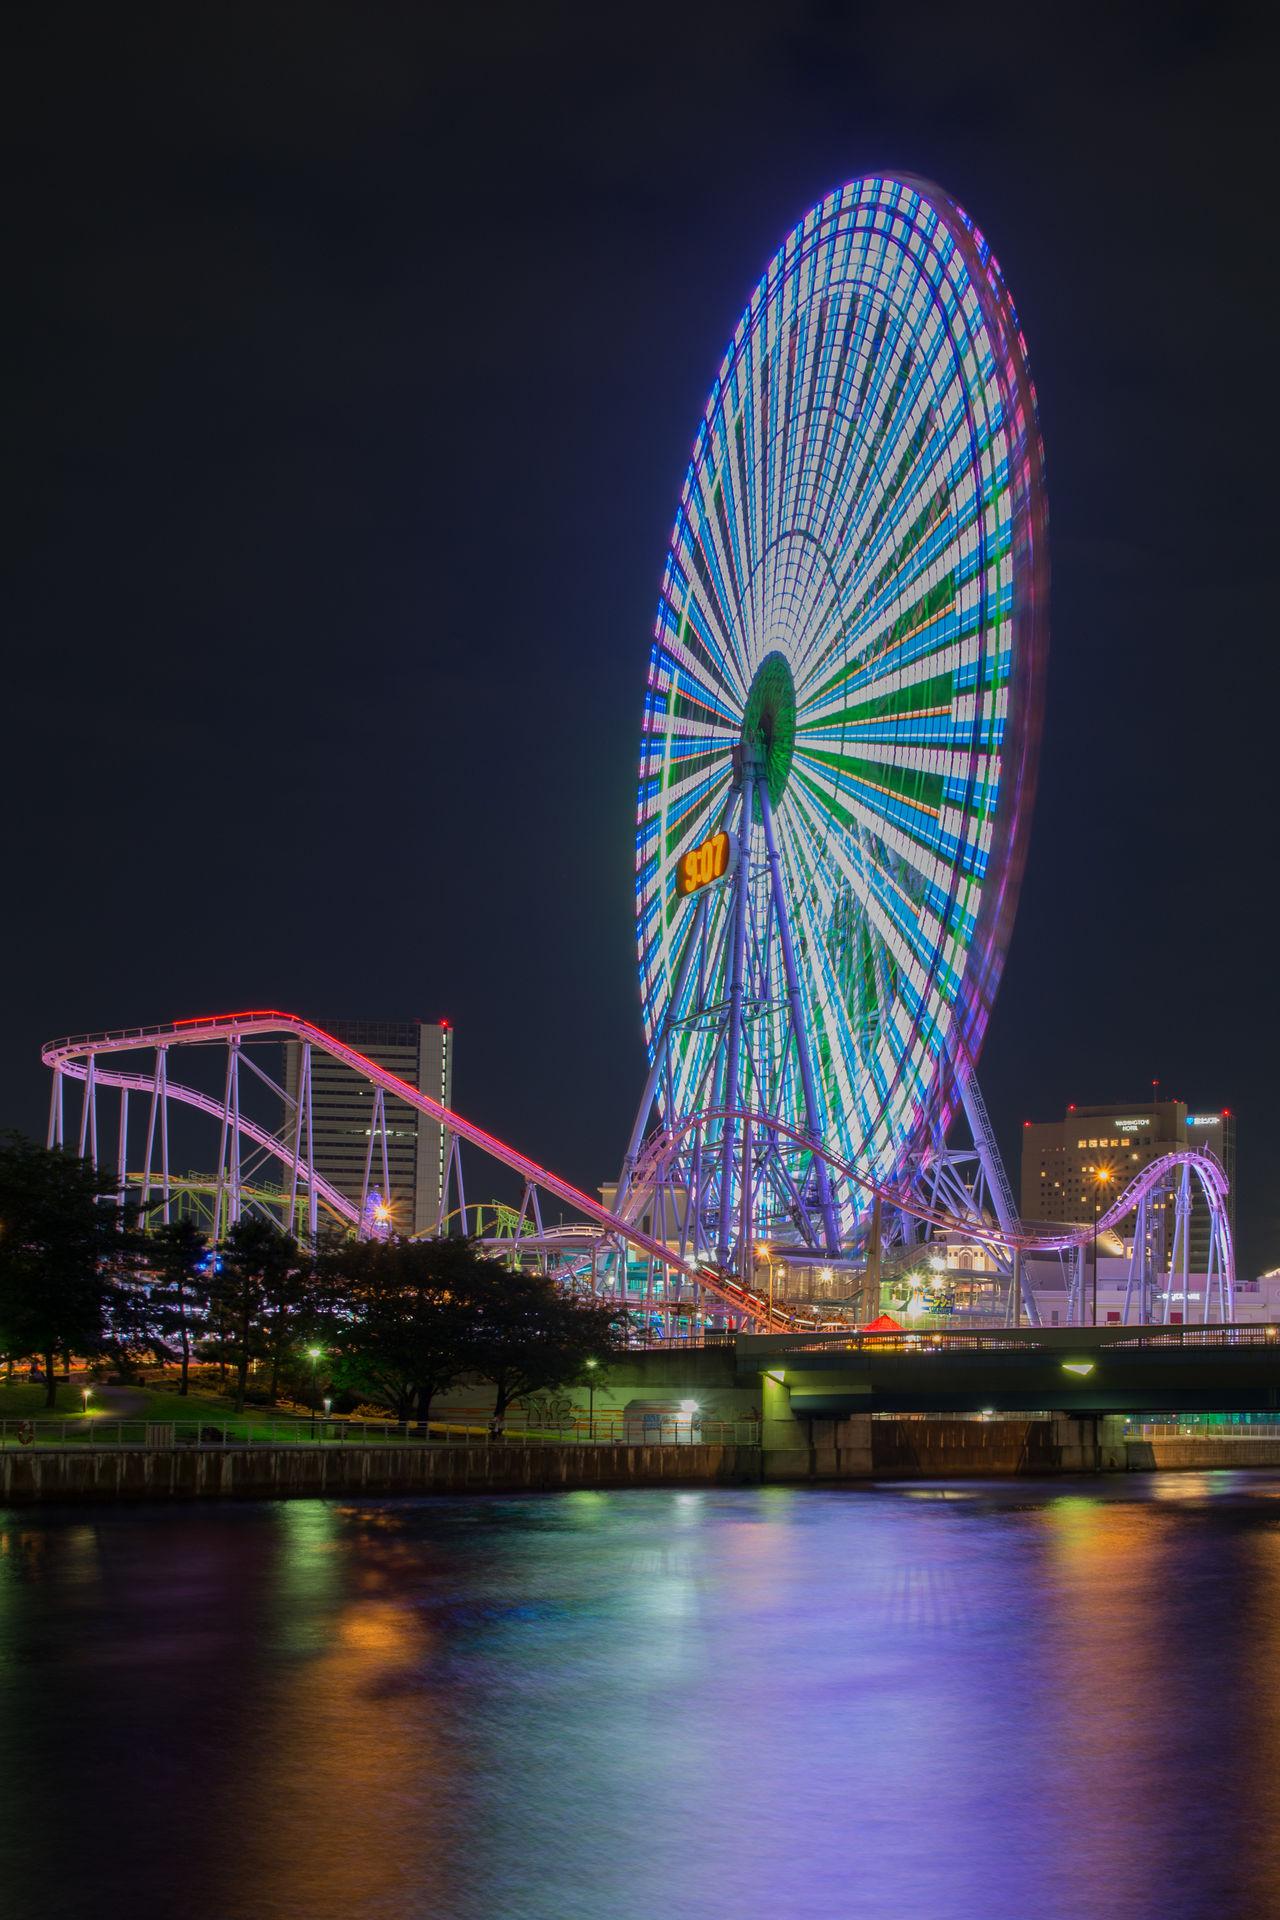 Cosmo World, Yokohama, Japan Amusement Park Amusement Park Ride Big Wheel Built Structure City Ferris Wheel Illuminated Japan Modern Multi Colored Night No People Outdoors River Travel Destinations Waterfront Yokohama